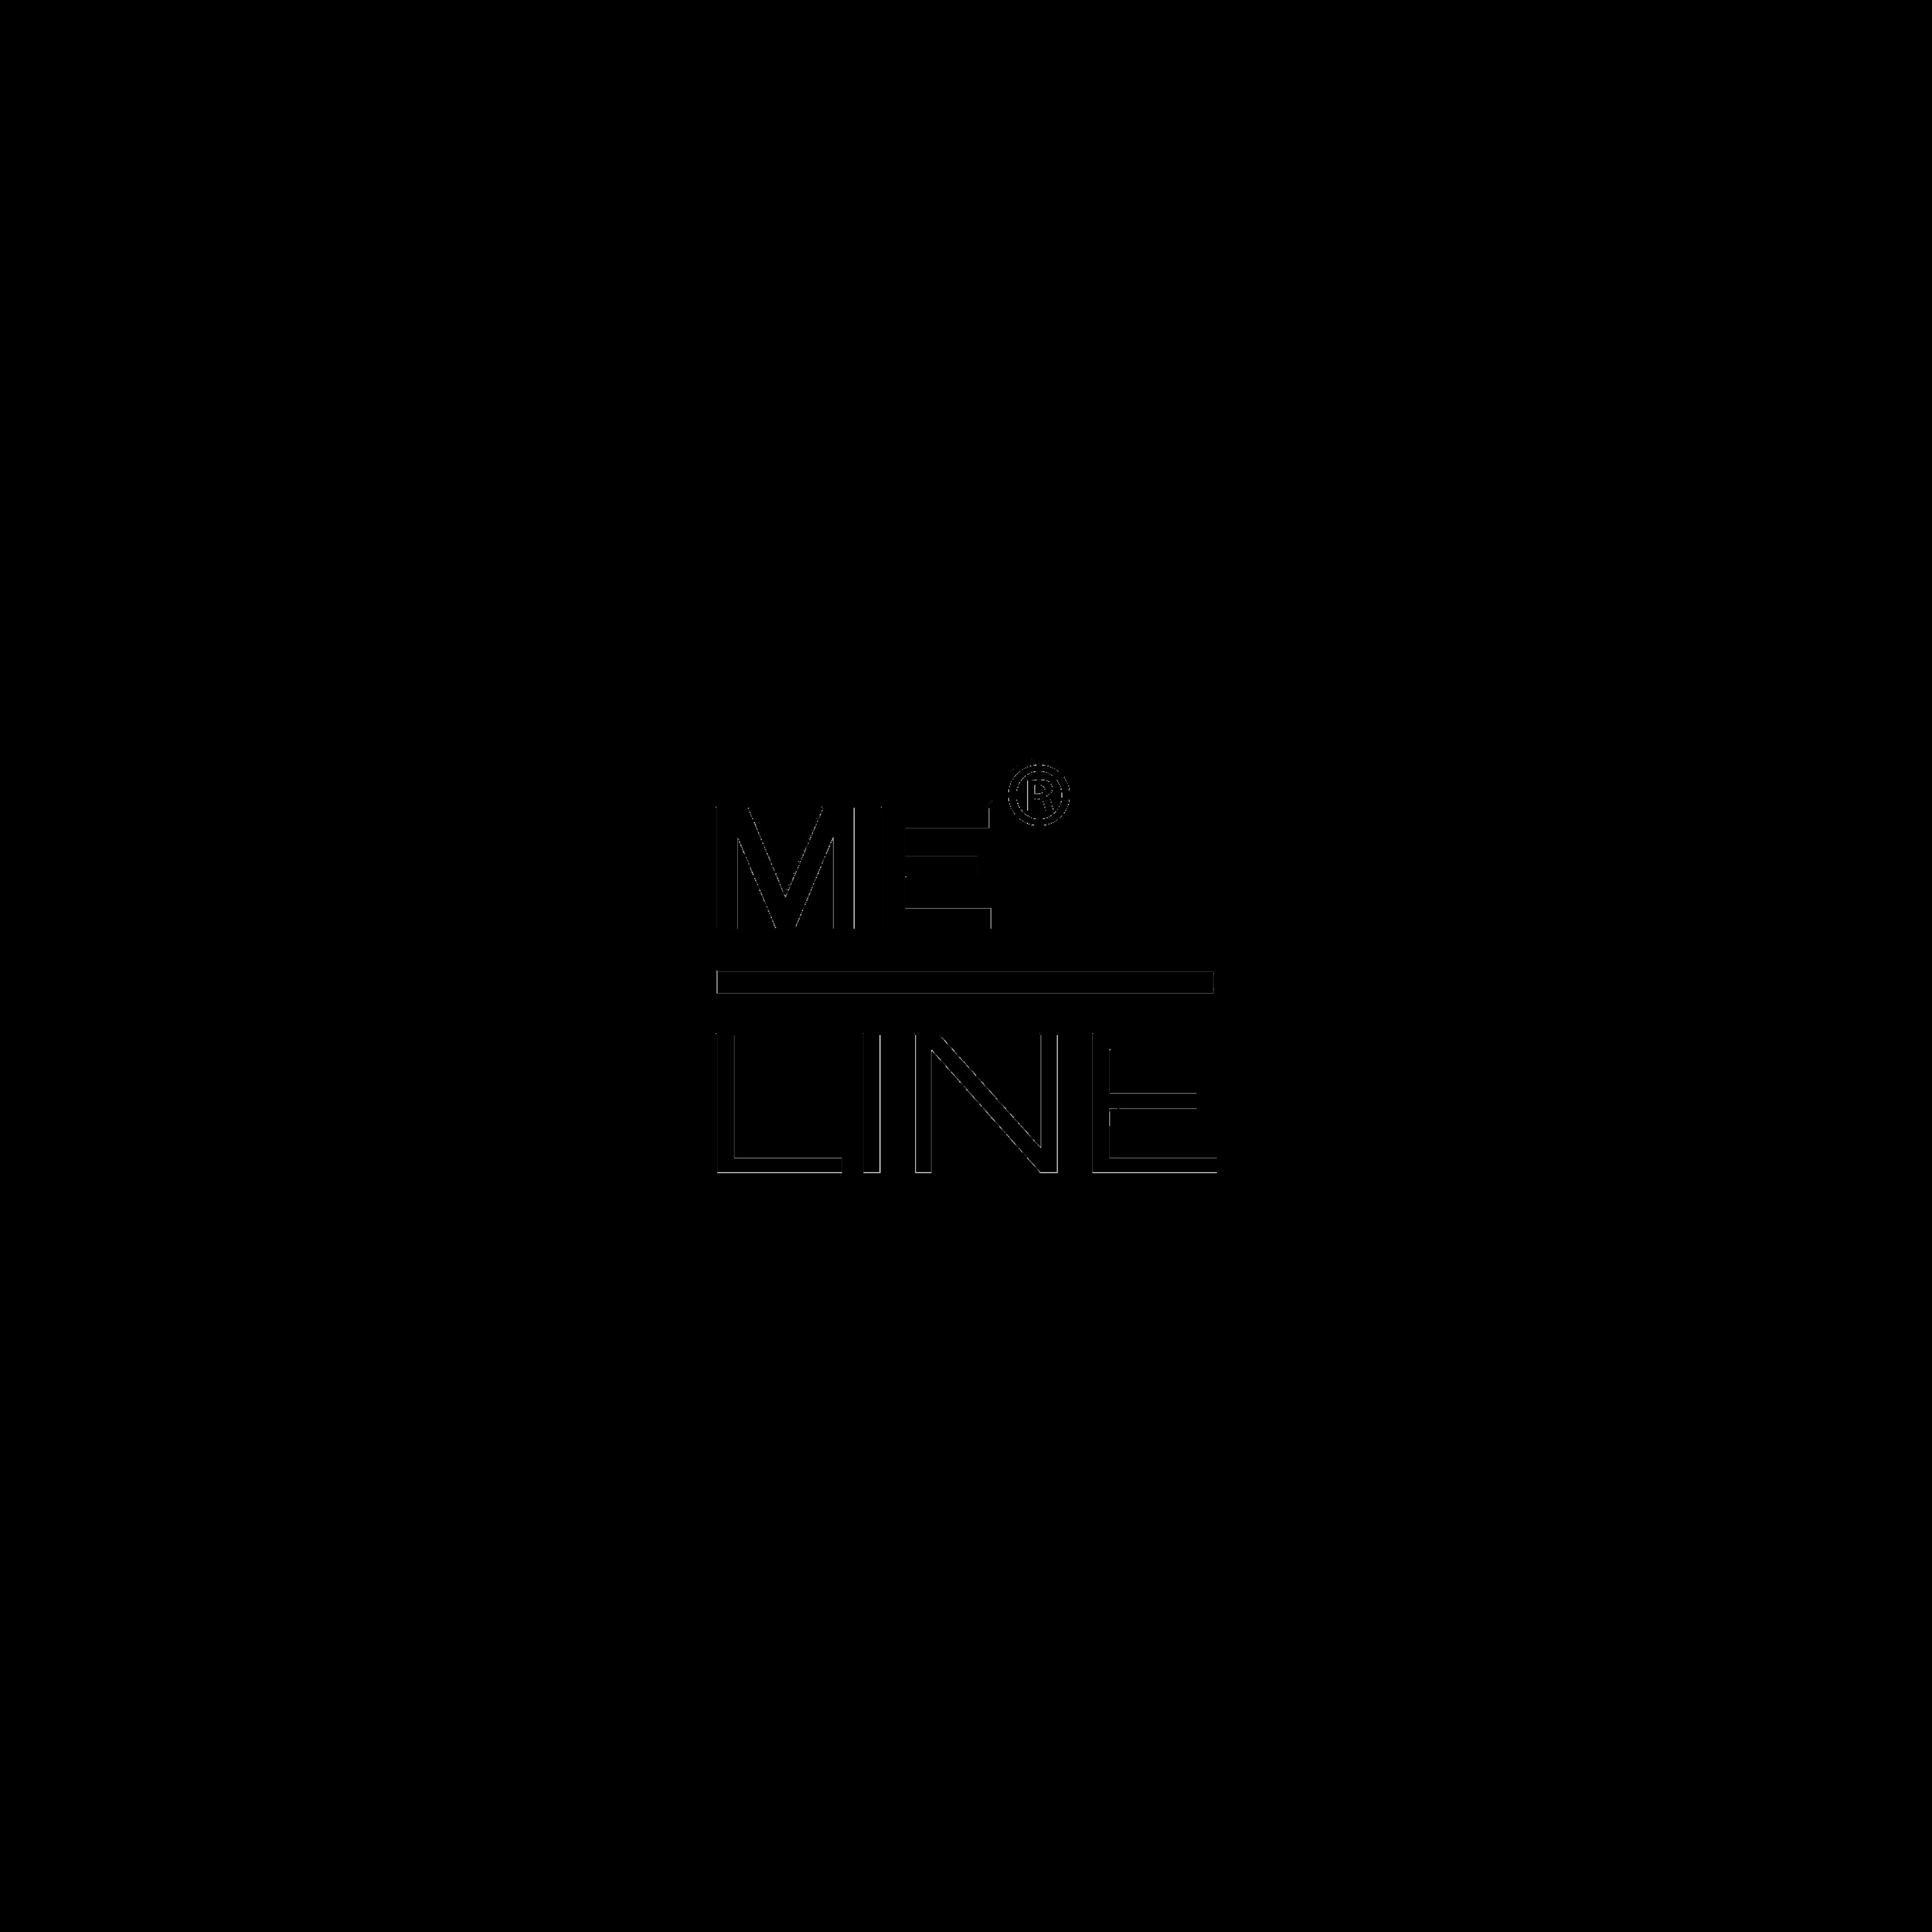 meline_undici